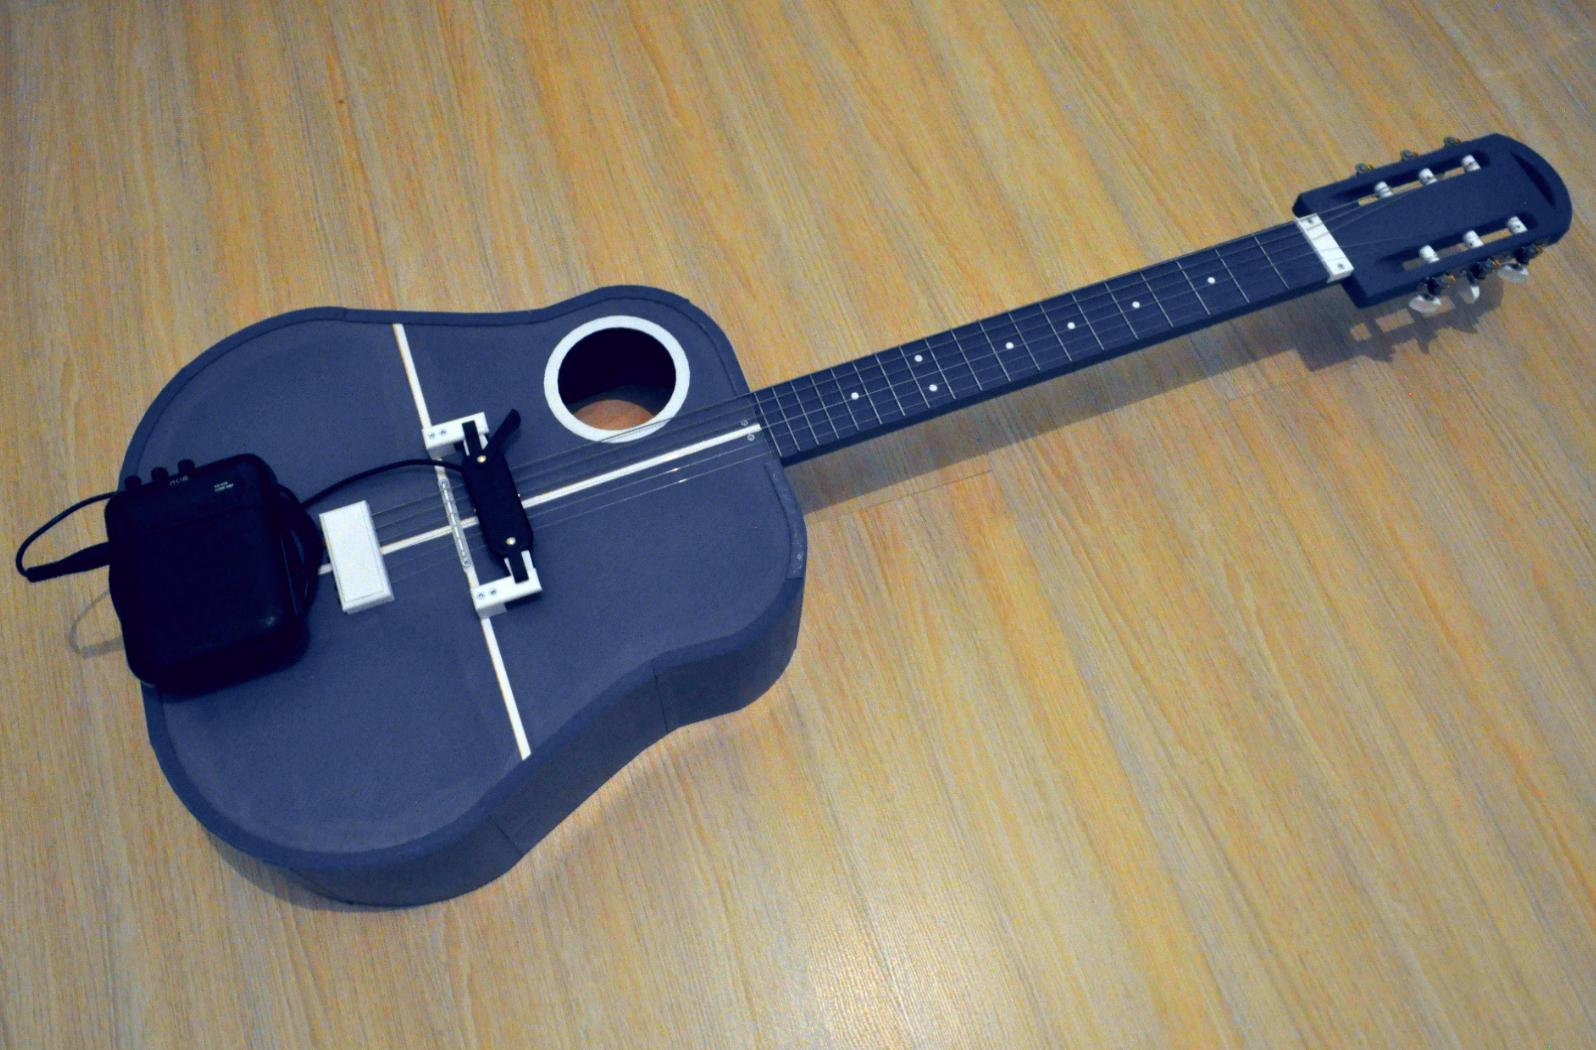 2.png Download free STL file Acoustic guitar with AROMA AG-03M amplifier • 3D printer model, CrocodileGene3d